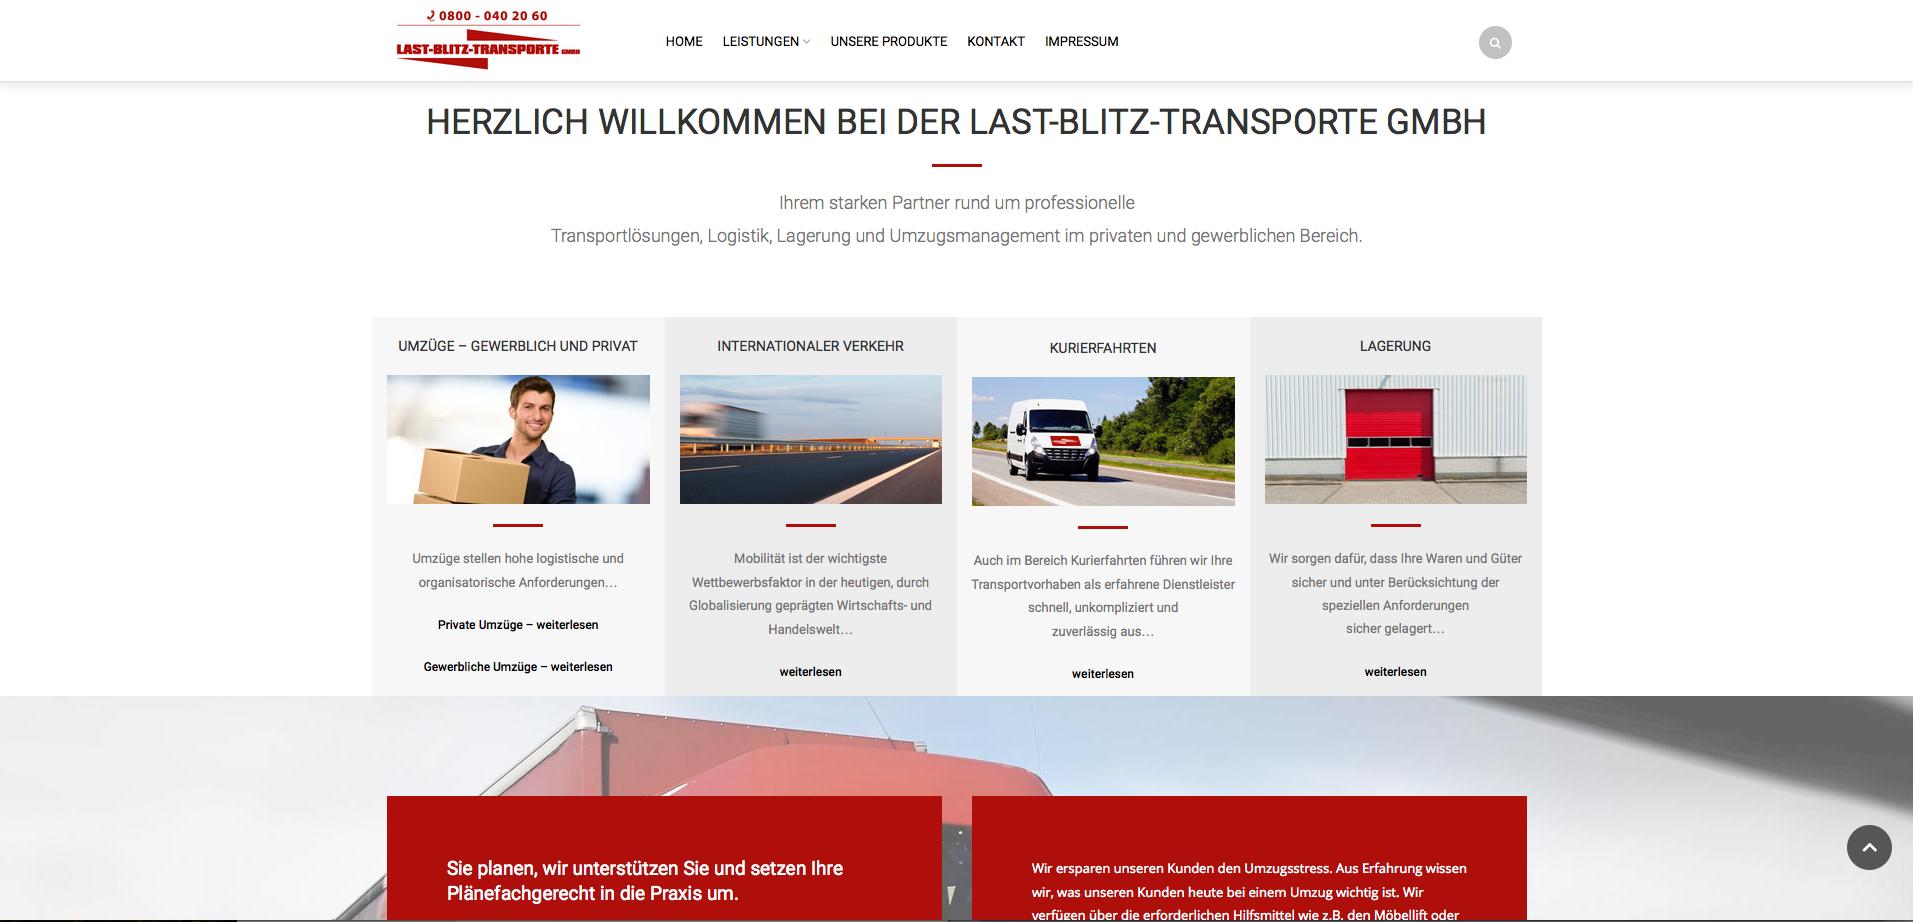 last-blitz-transporte.de